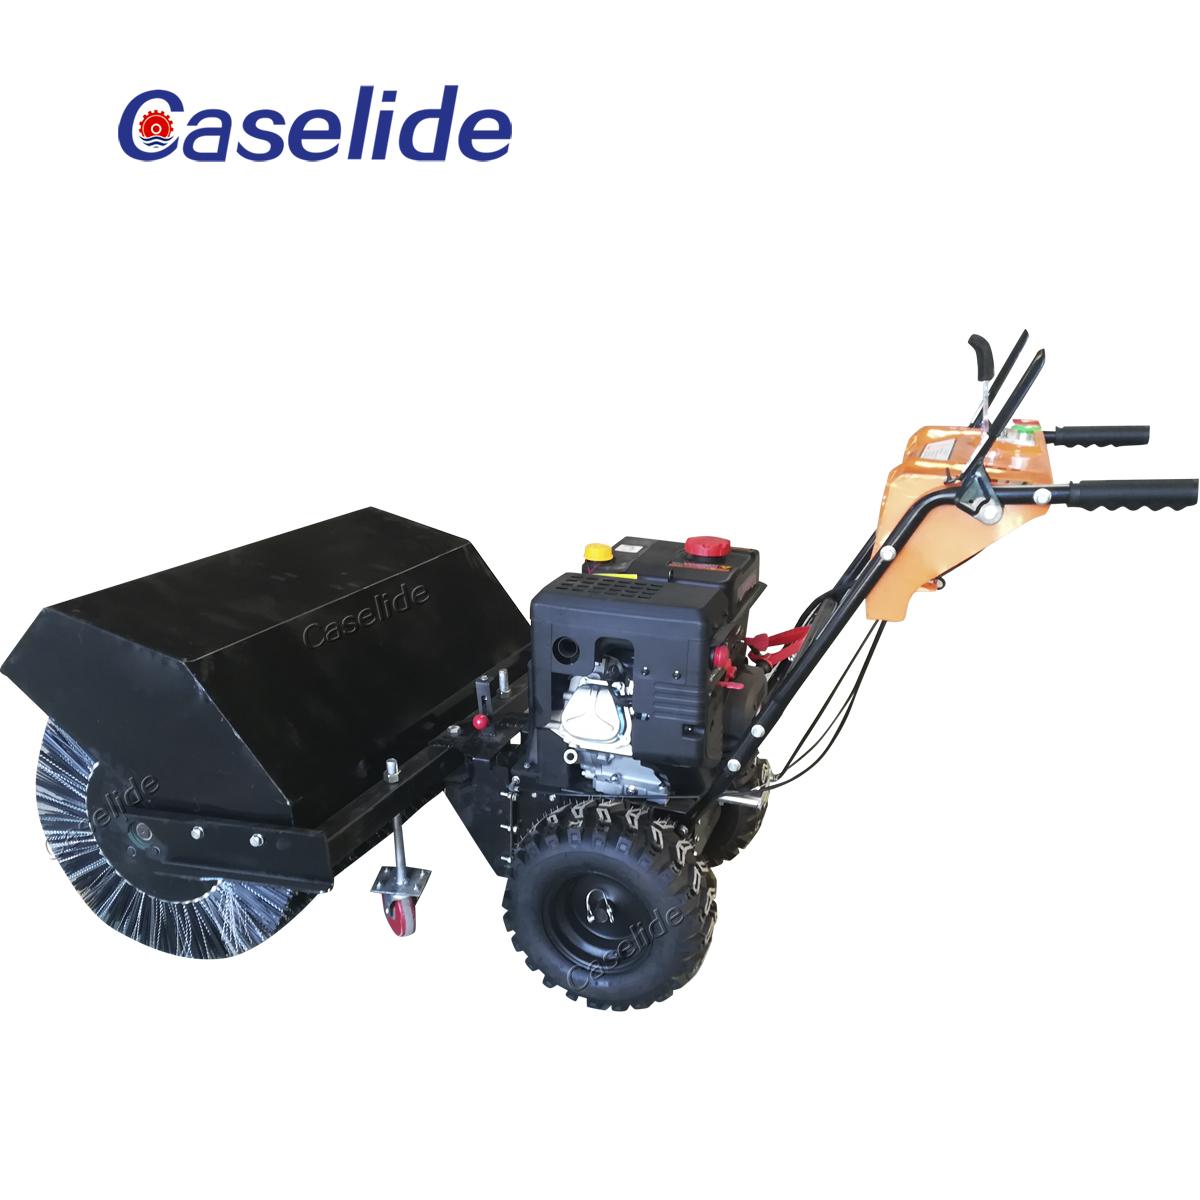 Snow blower engine light to snow blower snowplow led light